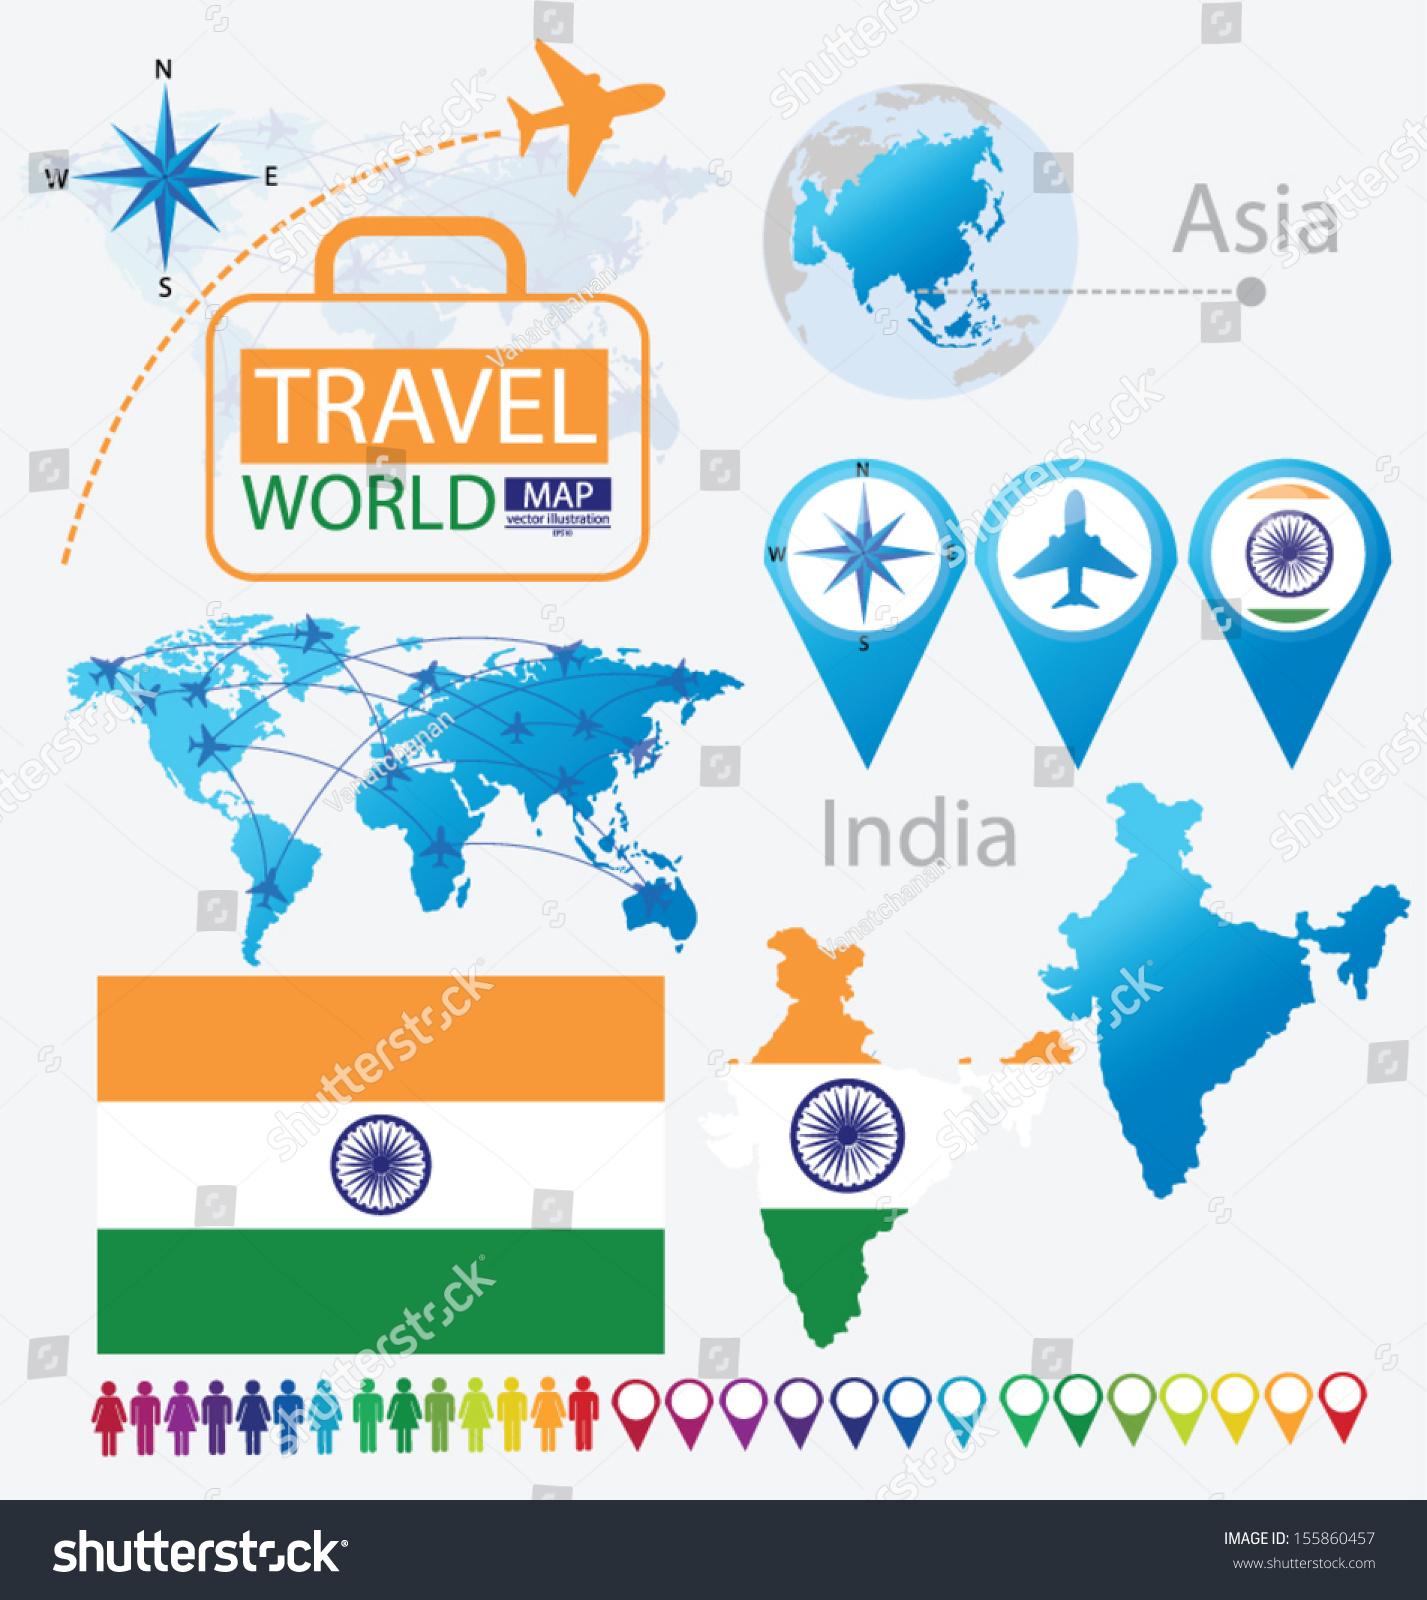 Republic india flag asia world map stock vector 155860457 republic of india flag asia world map travel vector illustration gumiabroncs Gallery